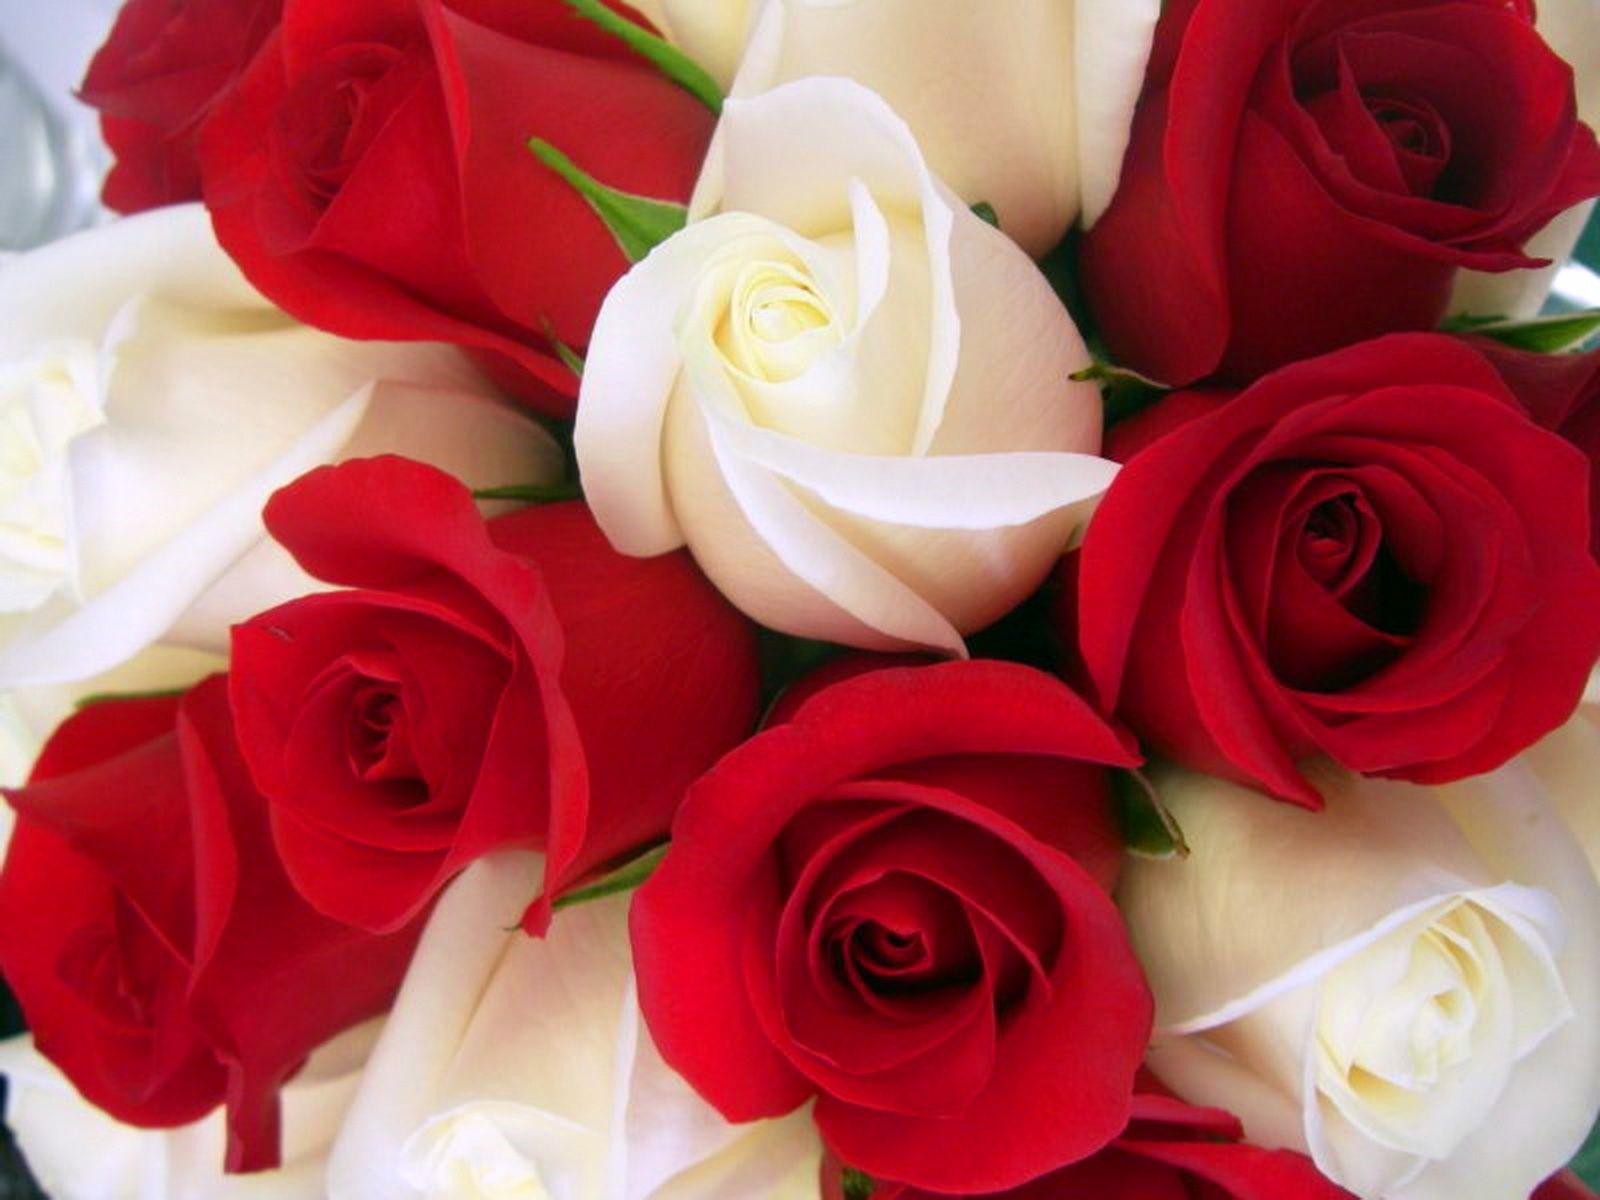 Rose 1080p Wallpapers